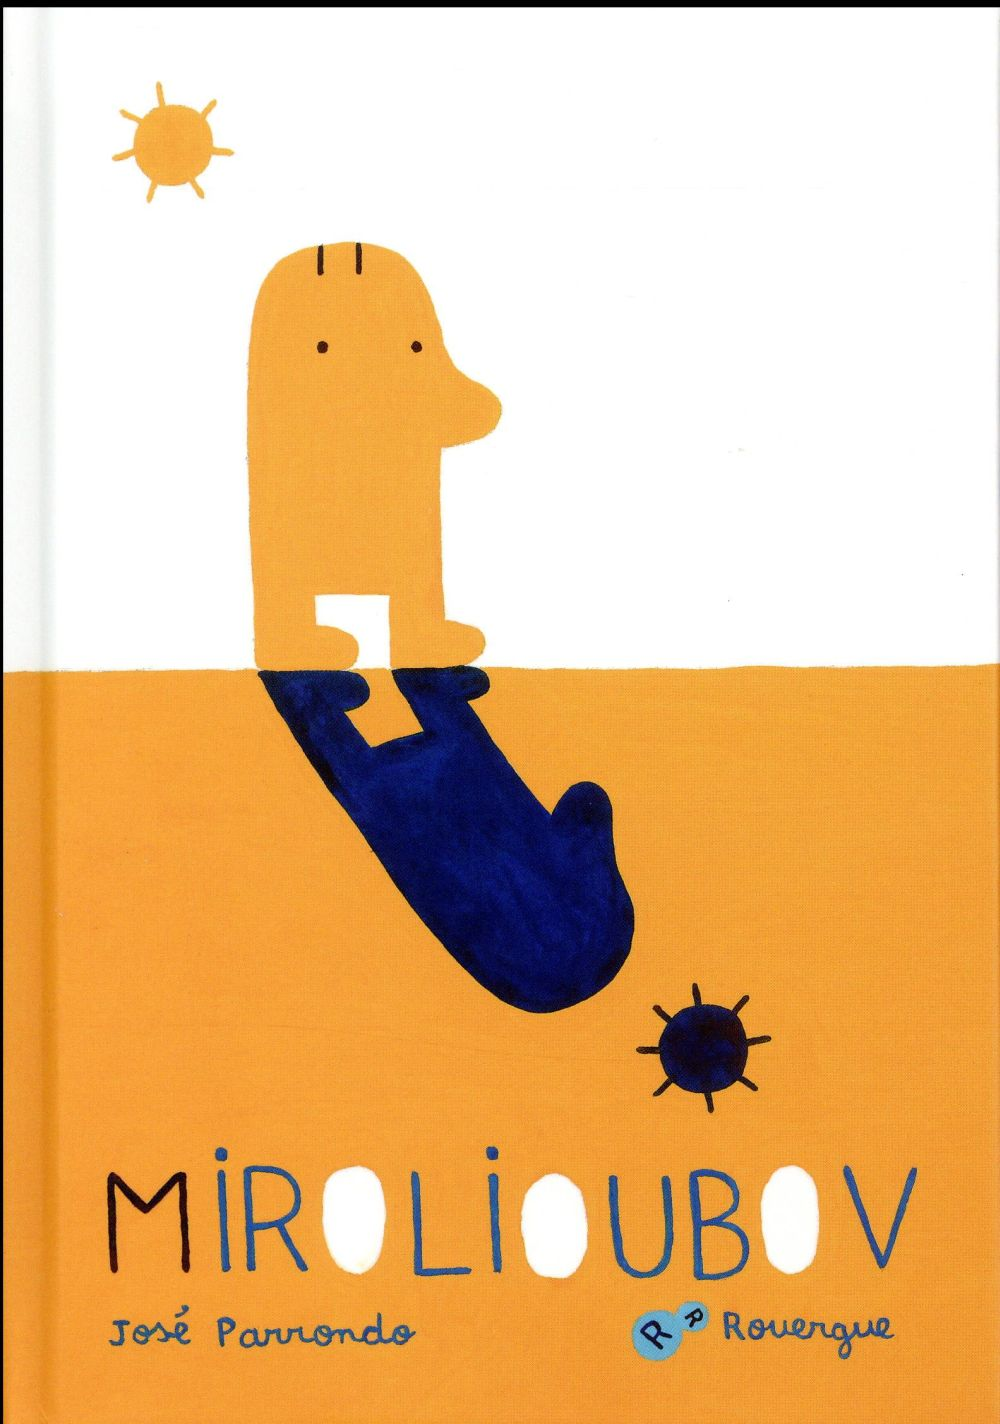 Mirolioubov